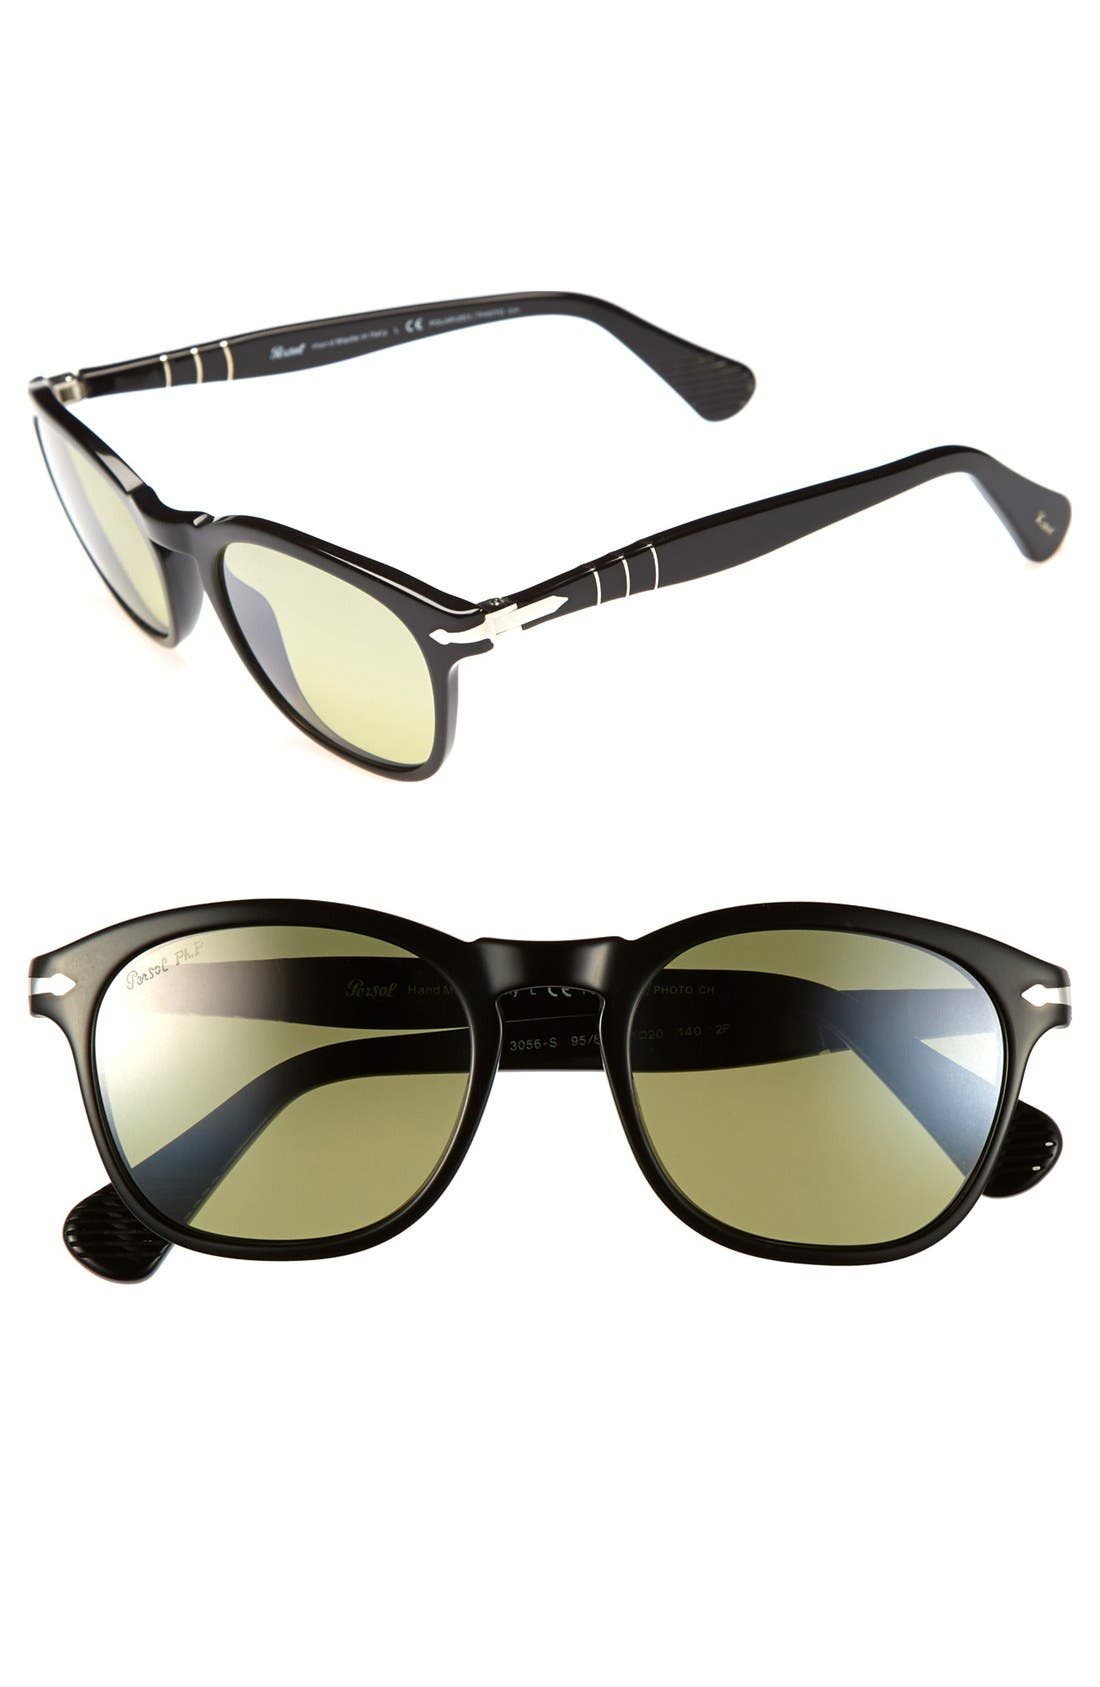 Alternate Image 1 Selected - Persol 51mm Retro Polarized Sunglasses